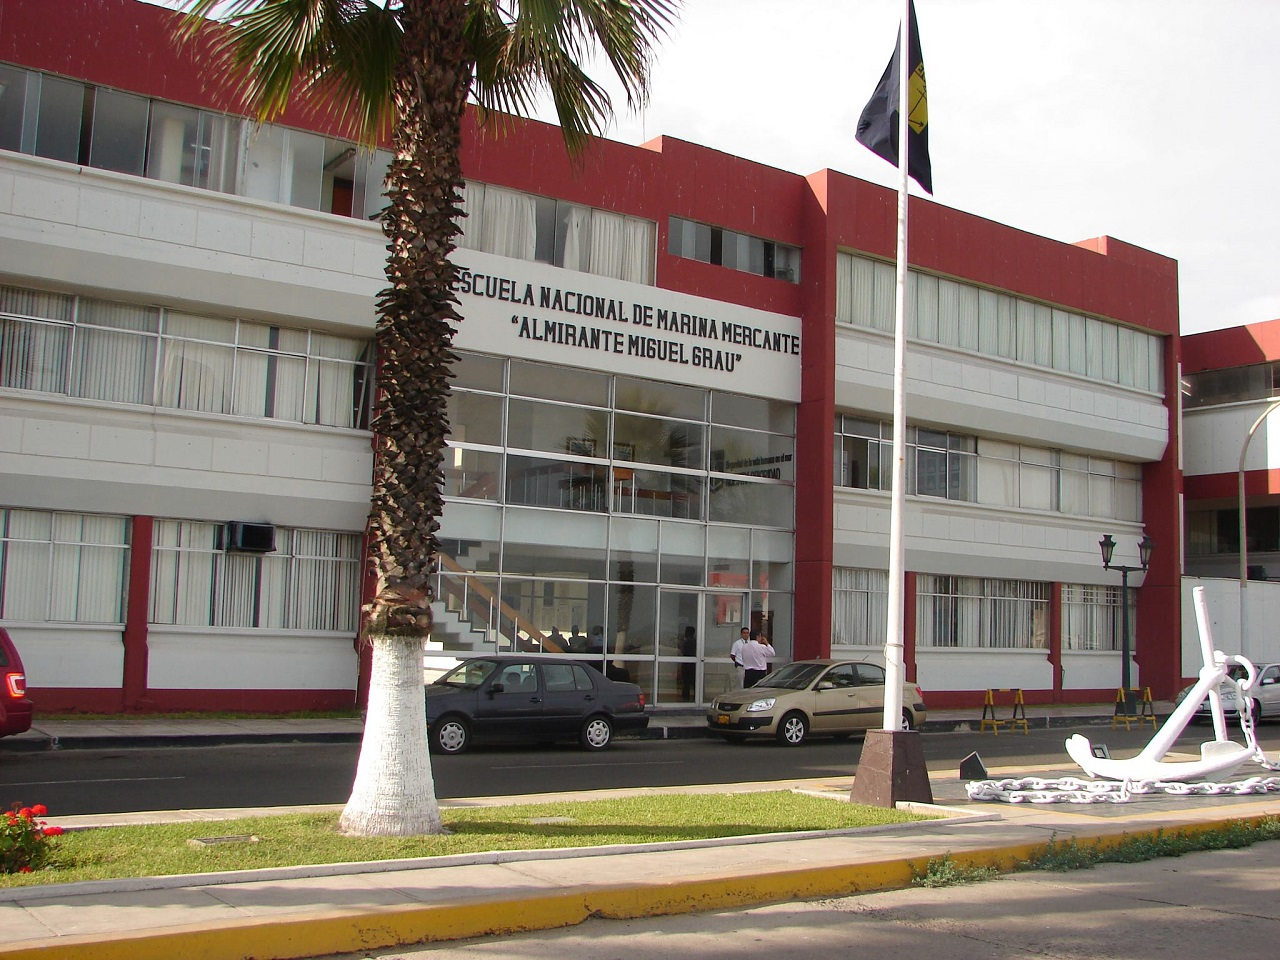 Escuela Nacional de Marina Mercante Almirante Miguel Grau